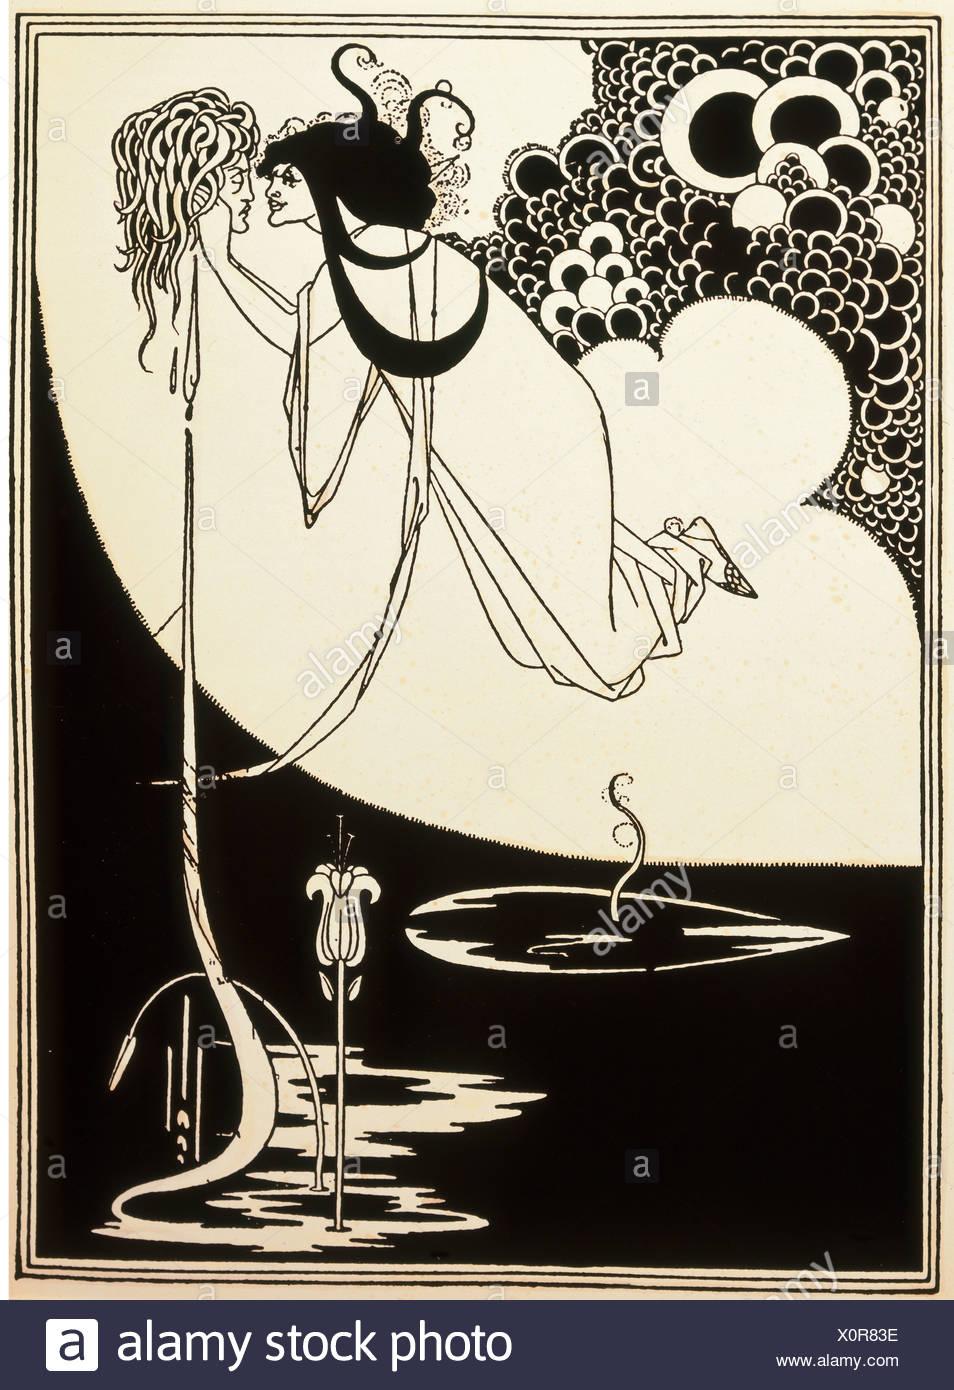 fine arts, Beardsley, Aubrey (1872 - 1898), print, 'Die Apotheose', illustration for the play 'Salome' by Oscar Wilde, England, - Stock Image